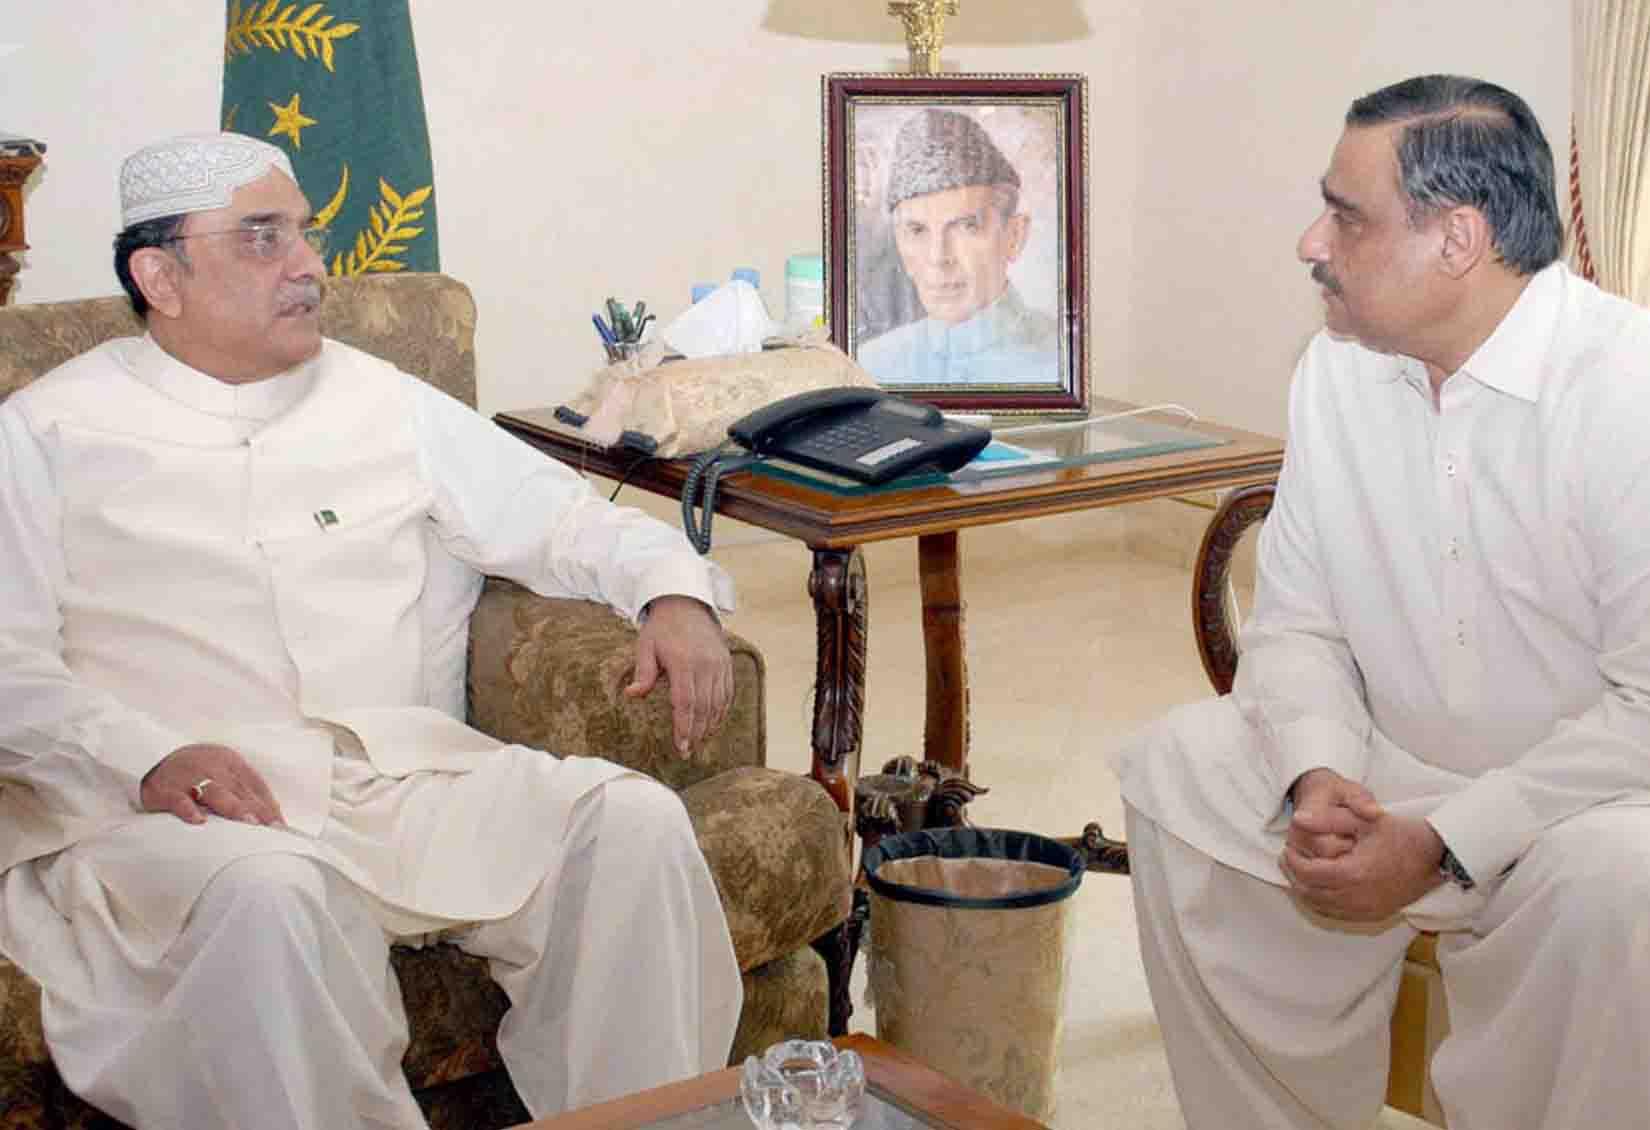 NAB questions close ally of Asif Zardari, Dr Asim Hussain